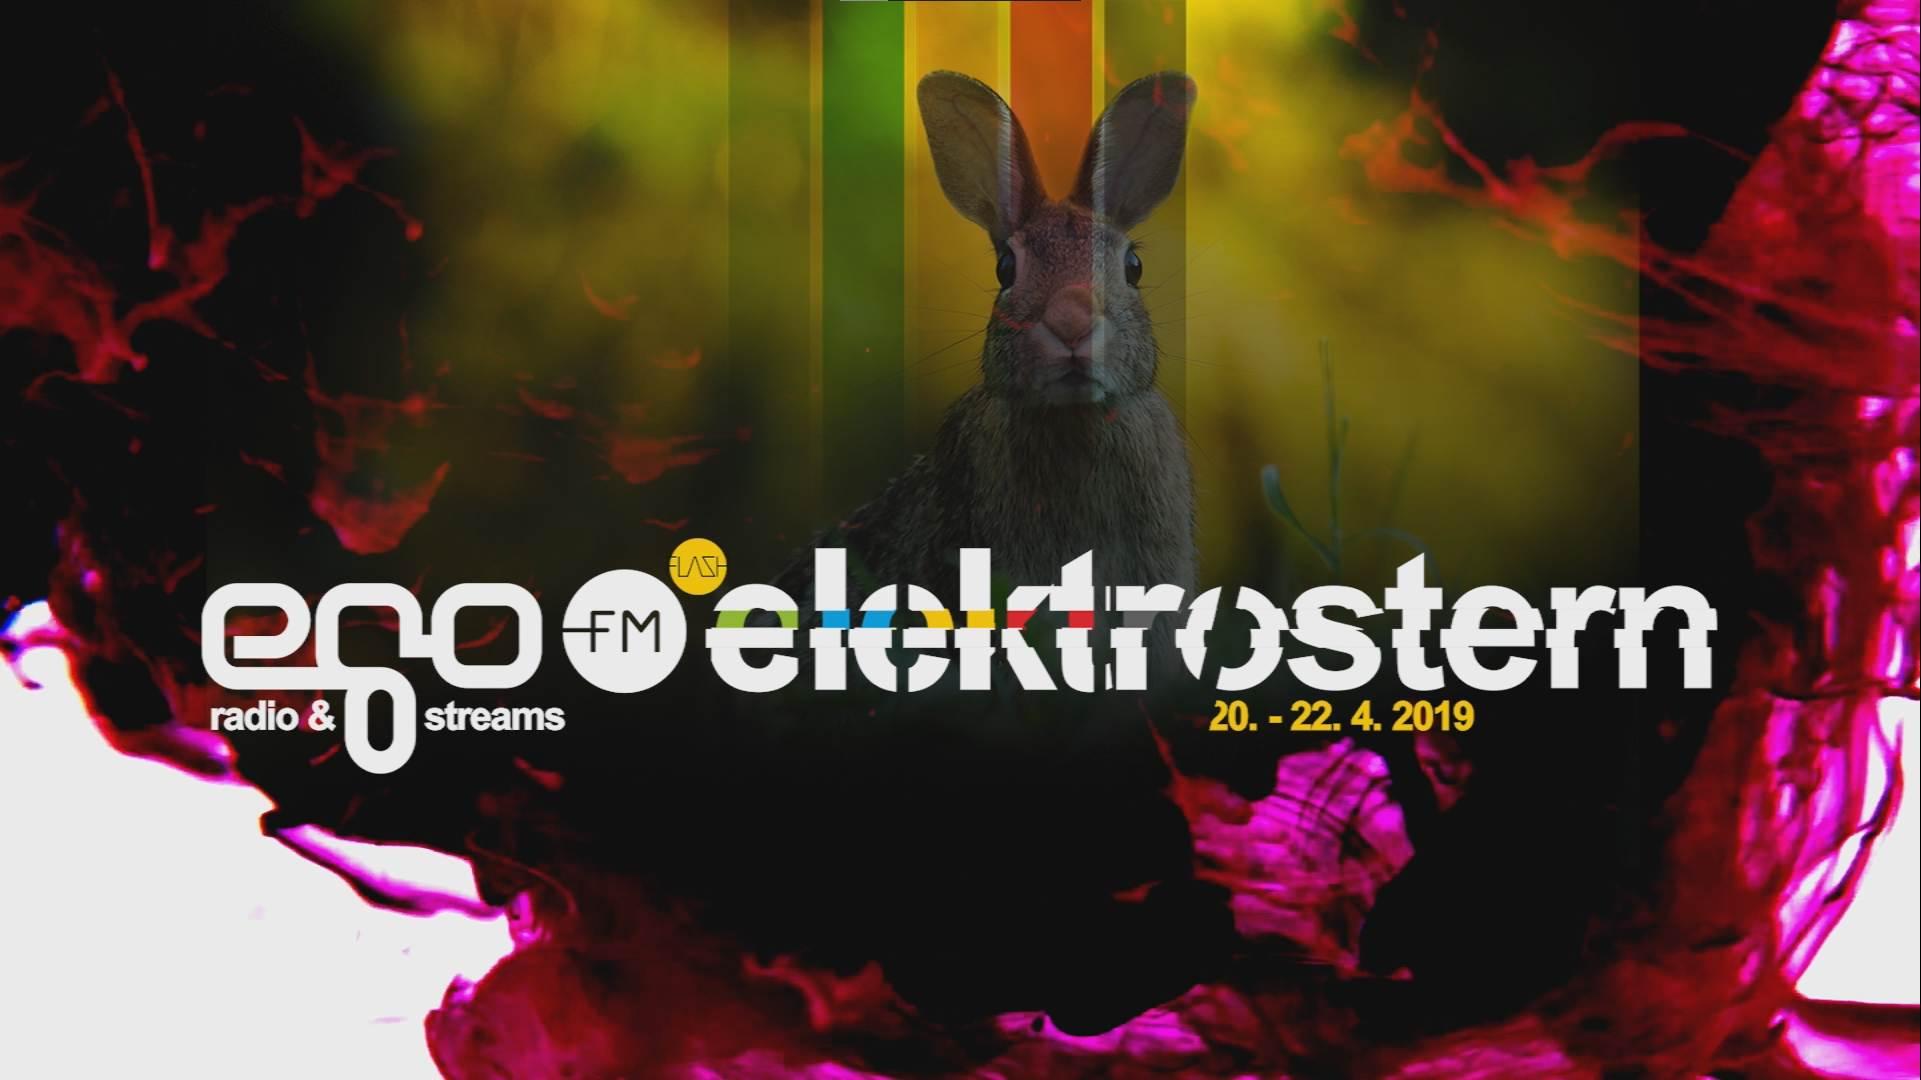 ElektrOstern-2019 - electro-ostern-fuer-egofm-title